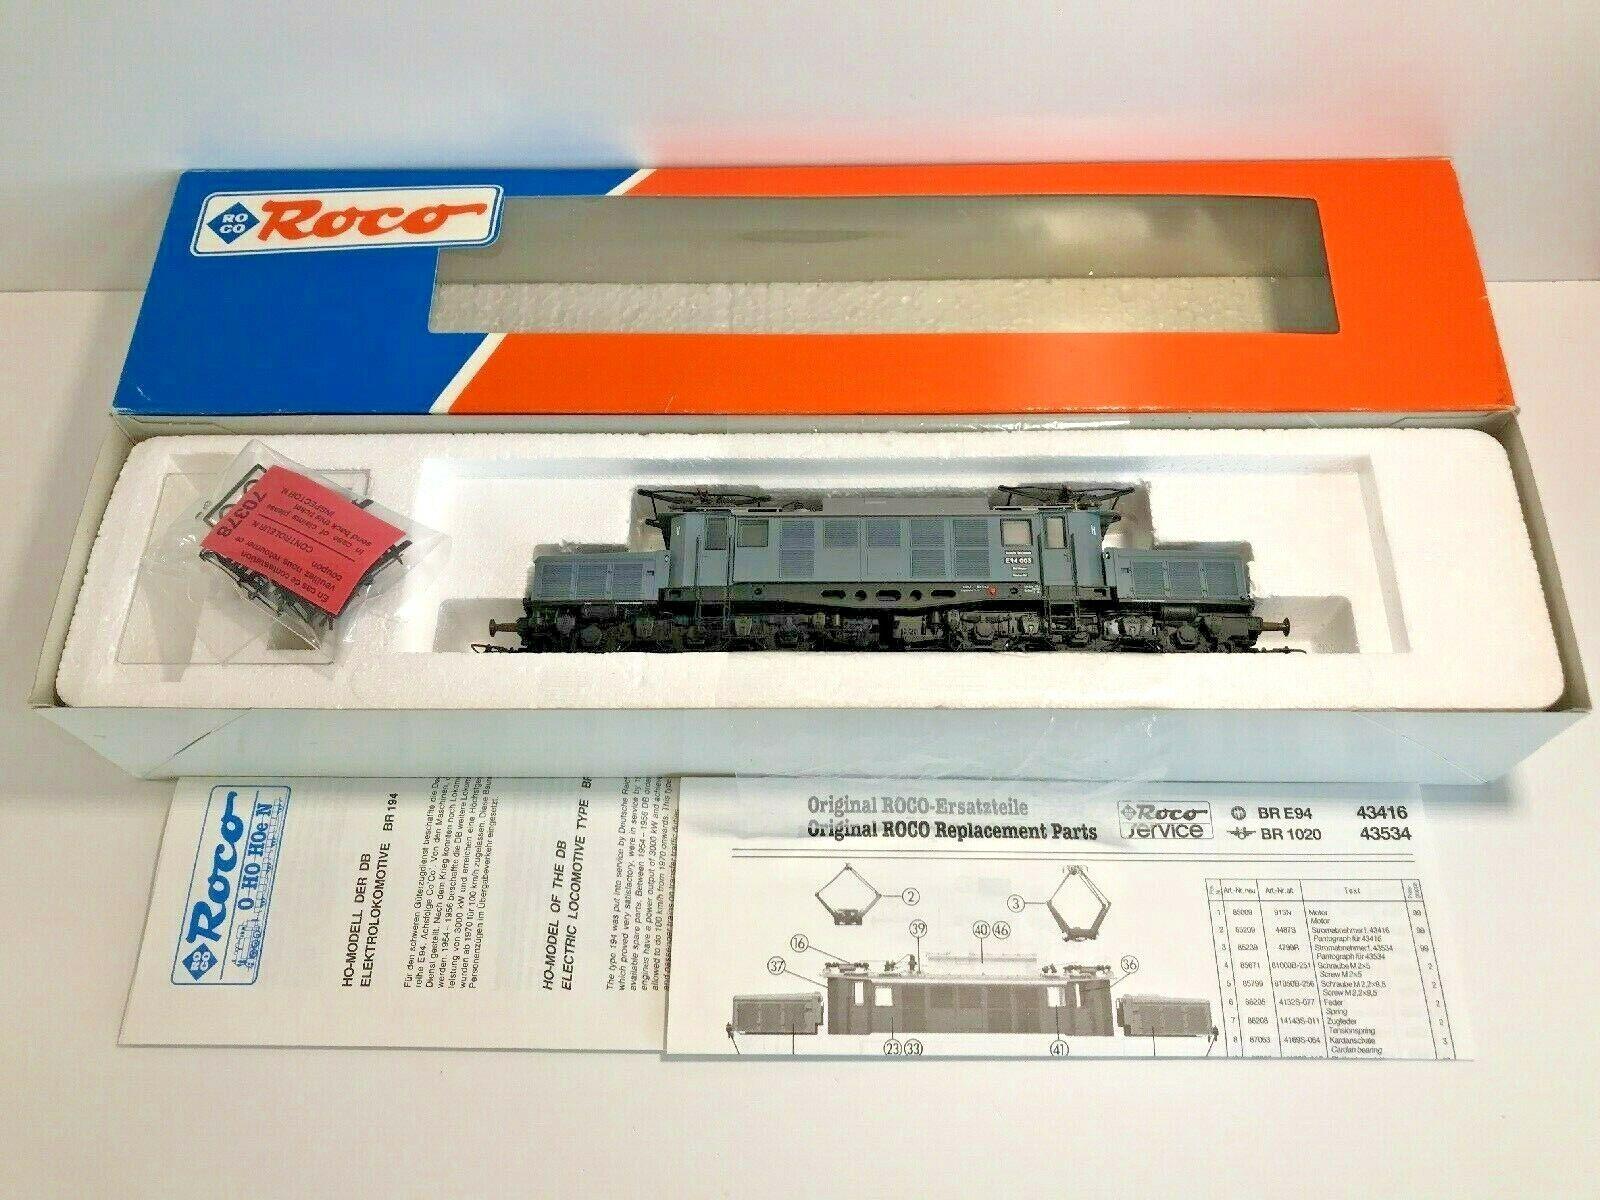 Roco 43416 - Locomotive électrique BR E94 003 DRG Crocodile DB HO, état neuf